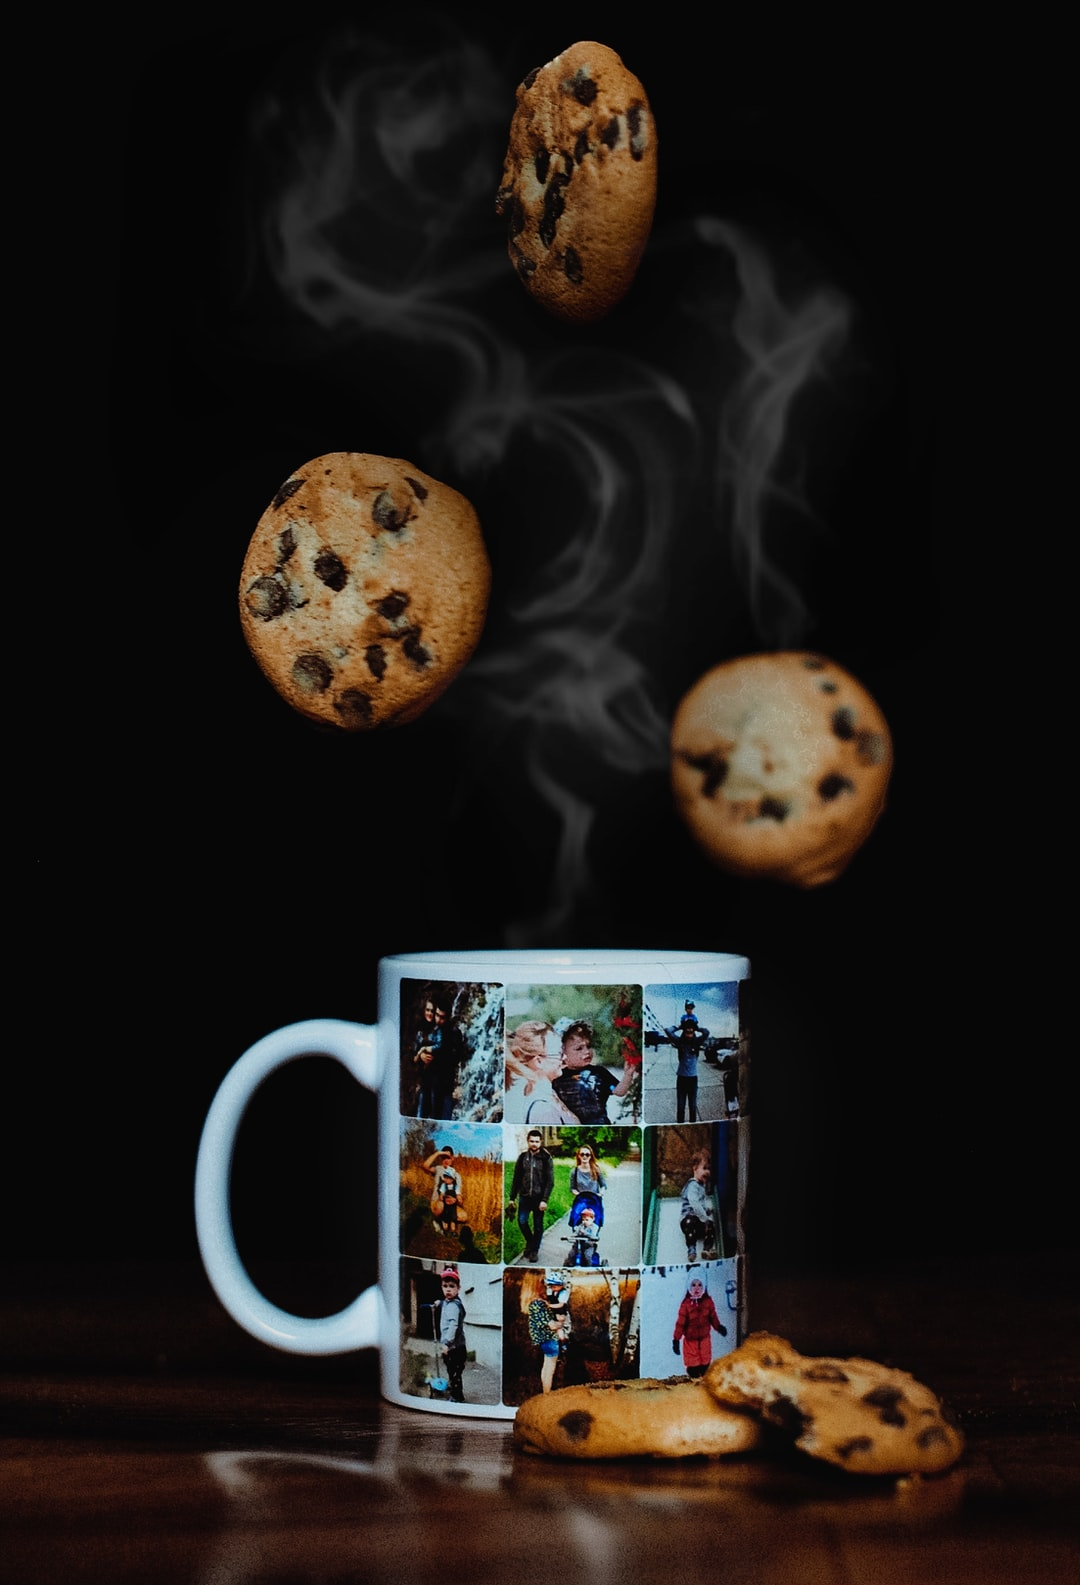 Collage on the mug by Instalook.ru